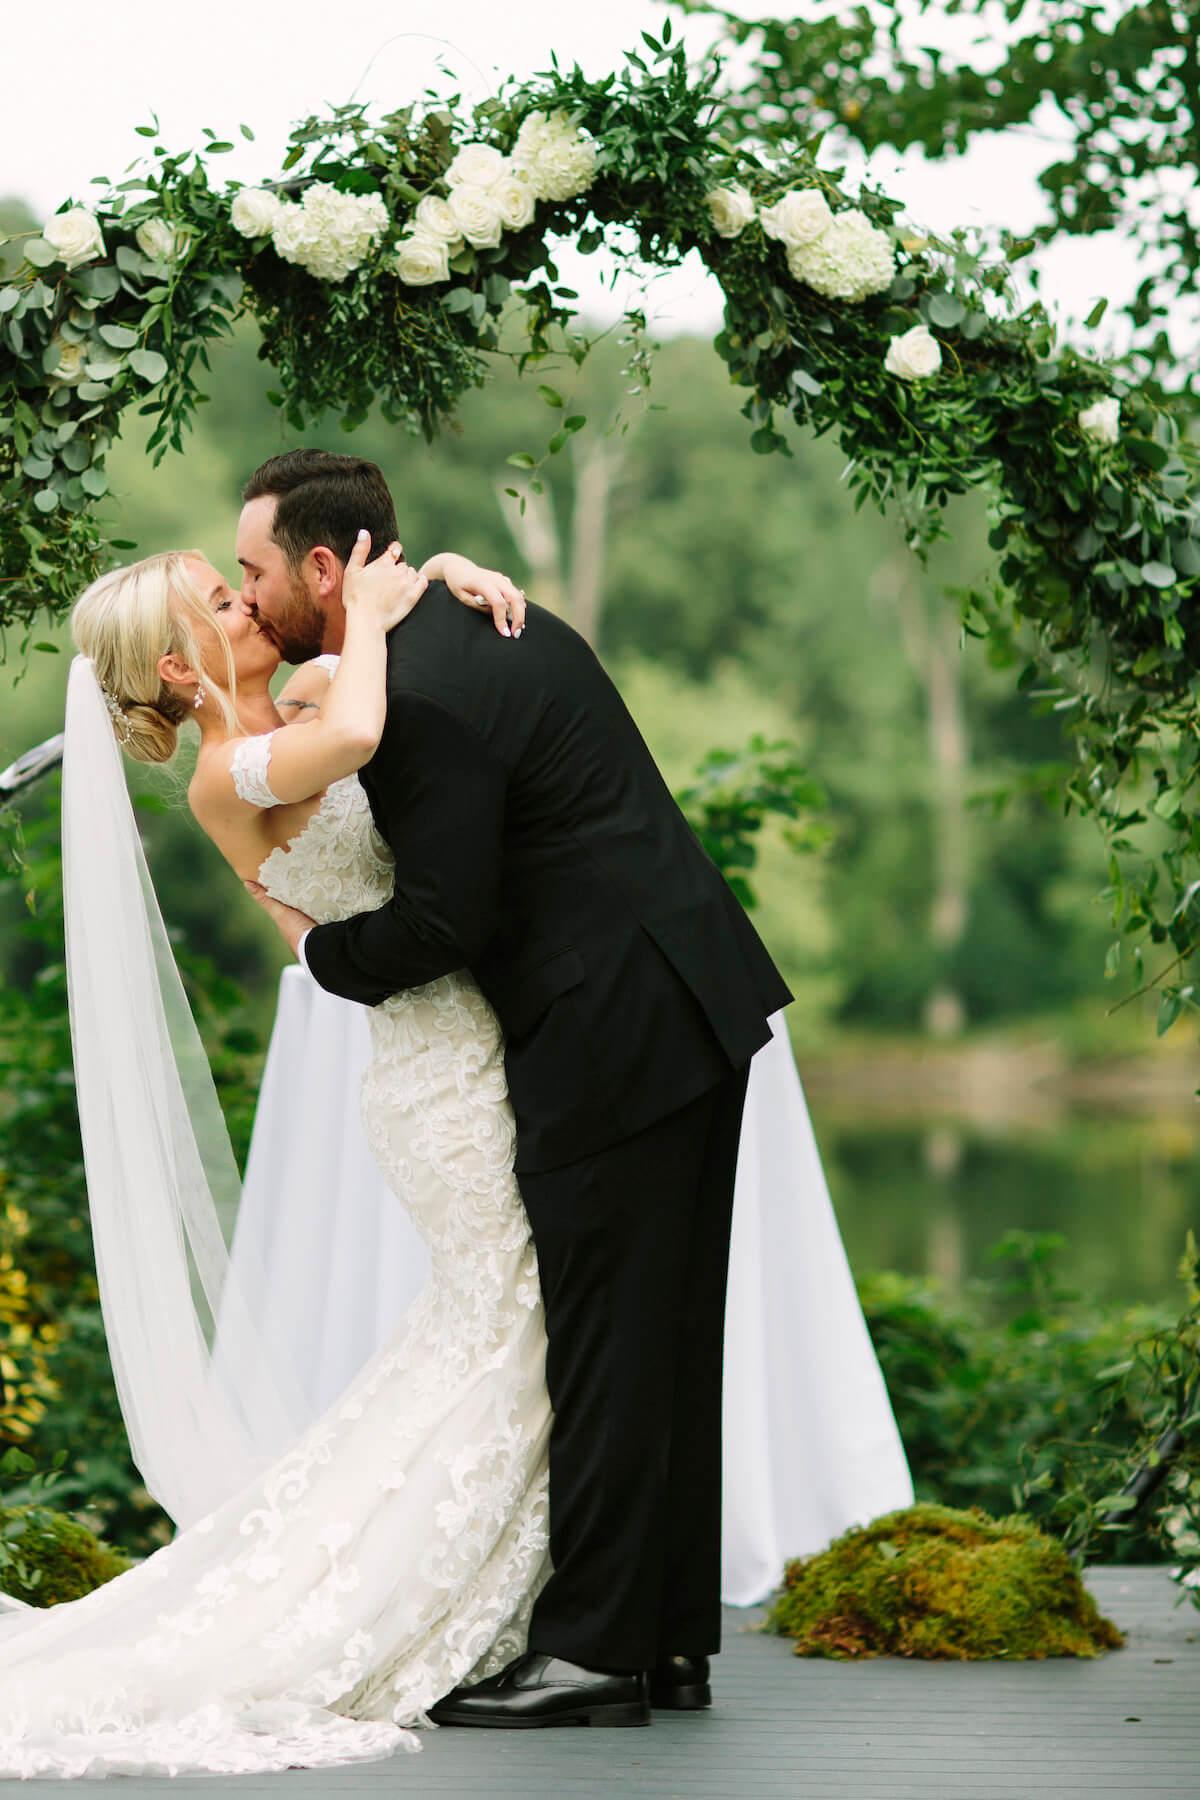 engle-olson-april-cj-wedding-jessica-holleque-9.jpg